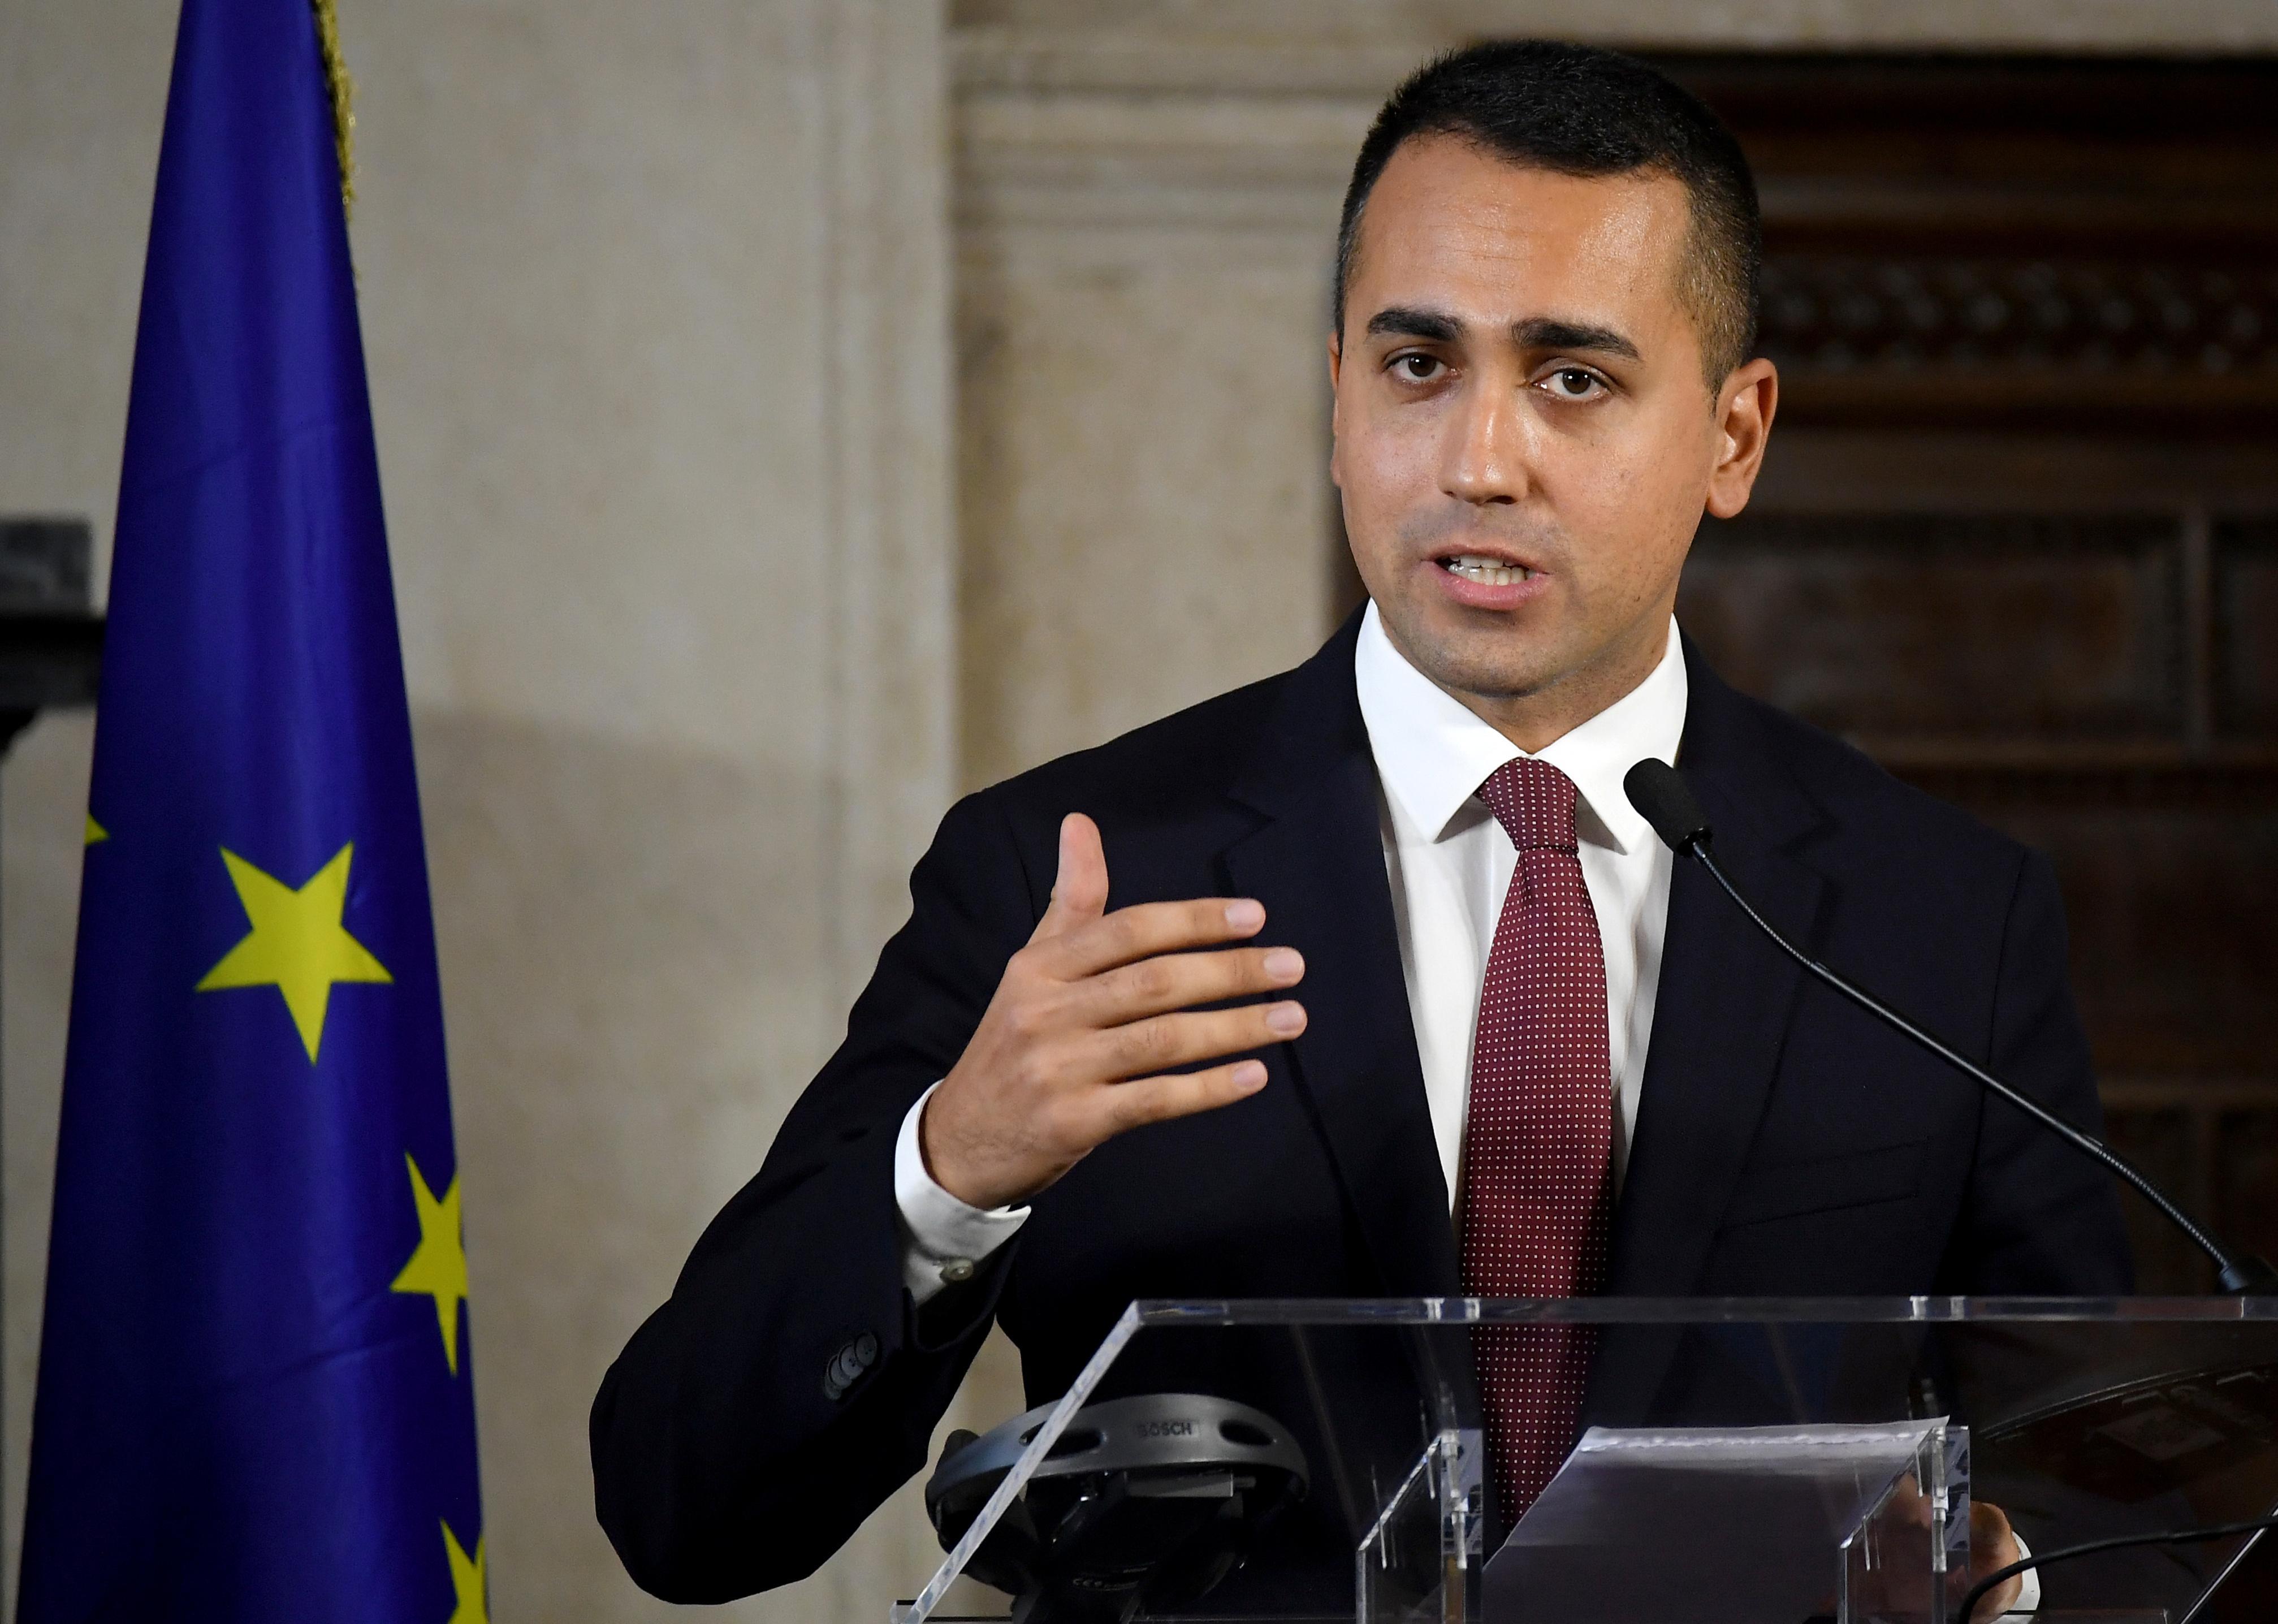 Italy says it wants to improve ESM reform, not veto it